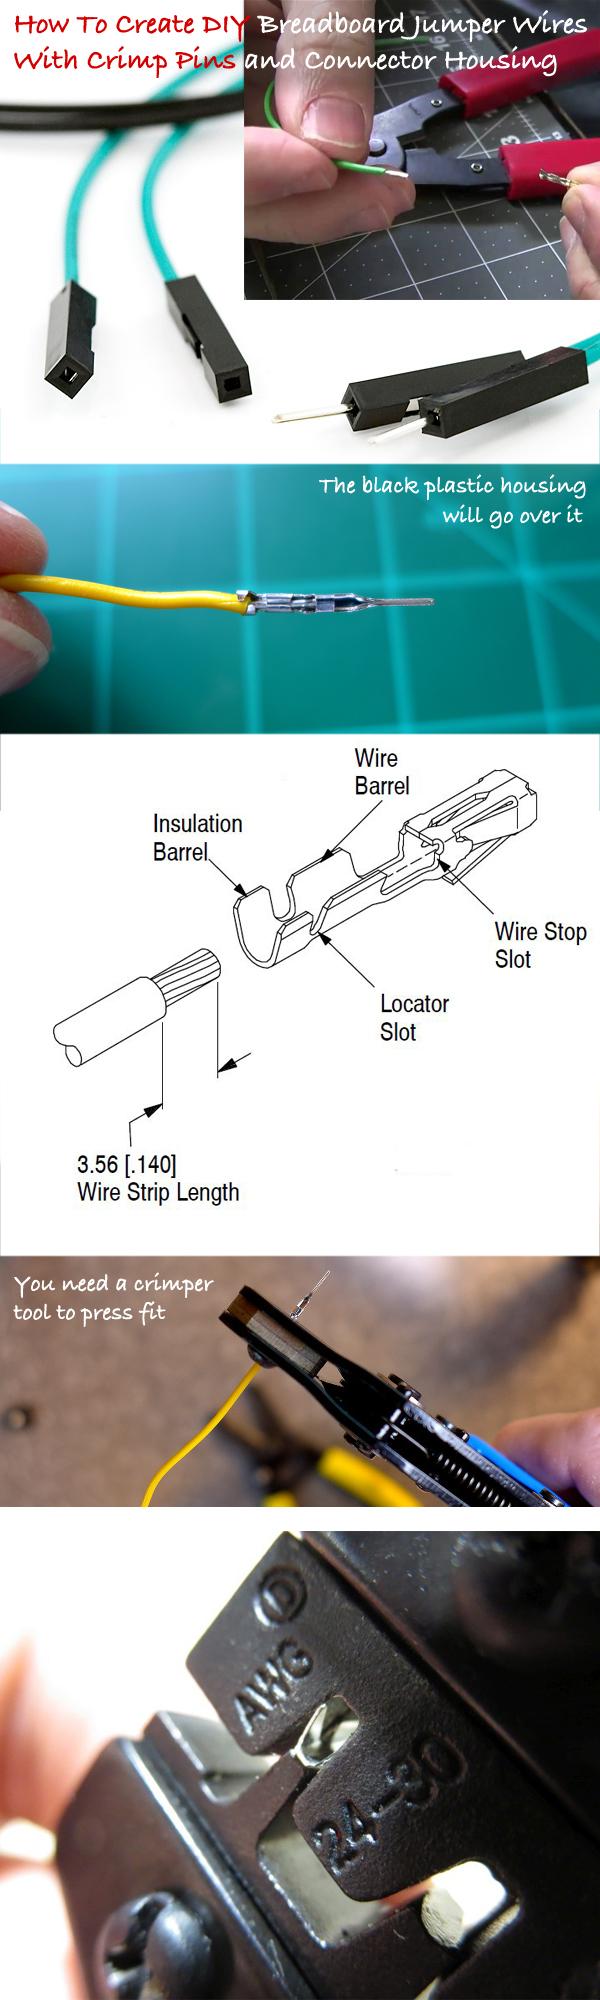 DIY-Breadboard-Jumper-Wires-Crimp-Pins-Connector-Housing